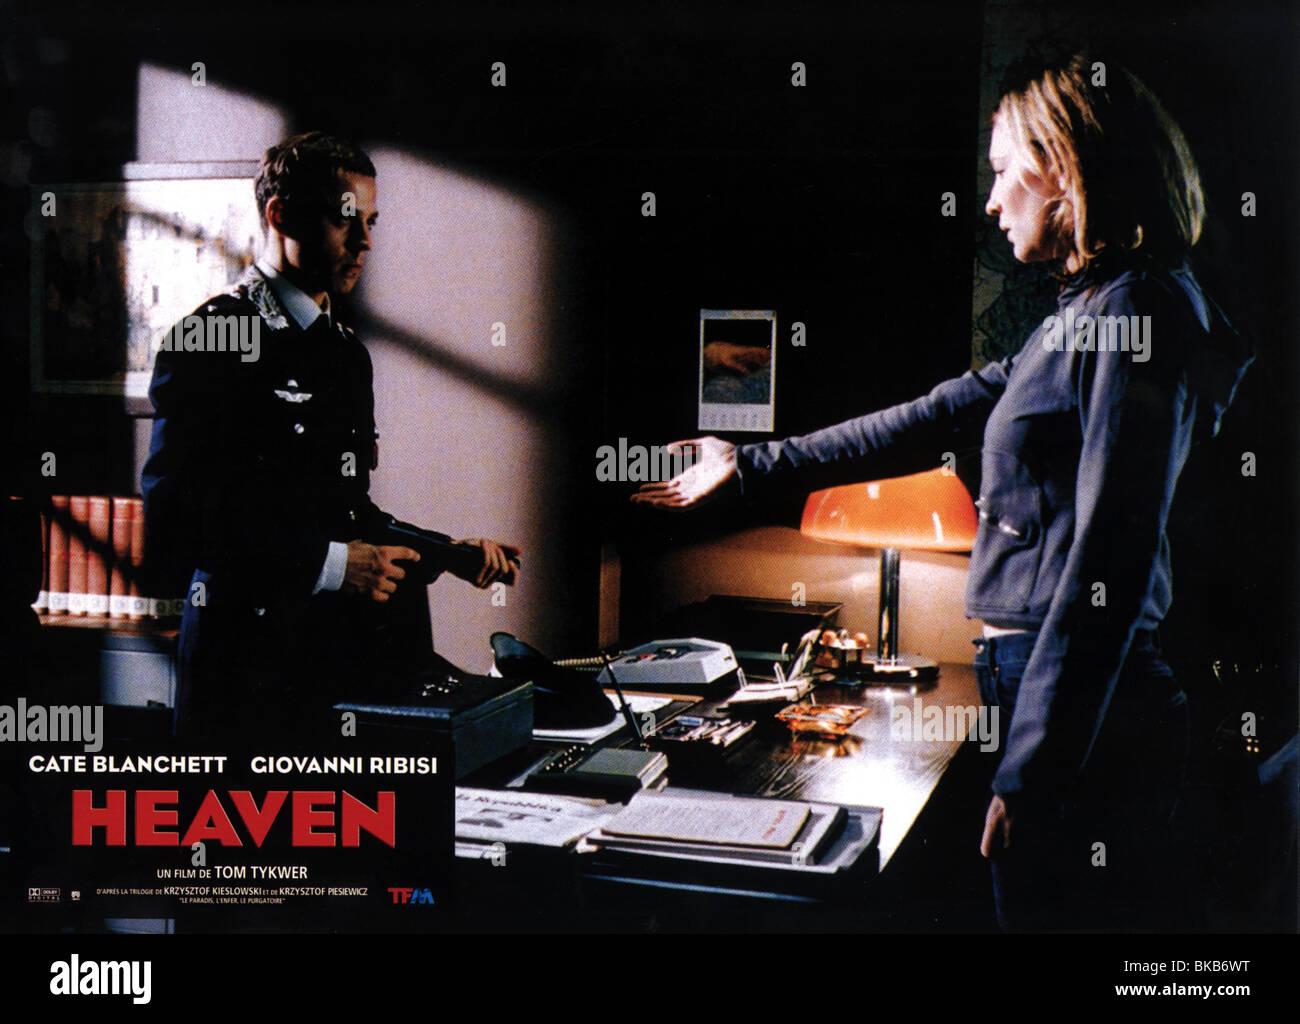 HEAVEN (2002) GIOVANNI RIBISI, CATE BLANCHETT HEVN 005FOH - Stock Image